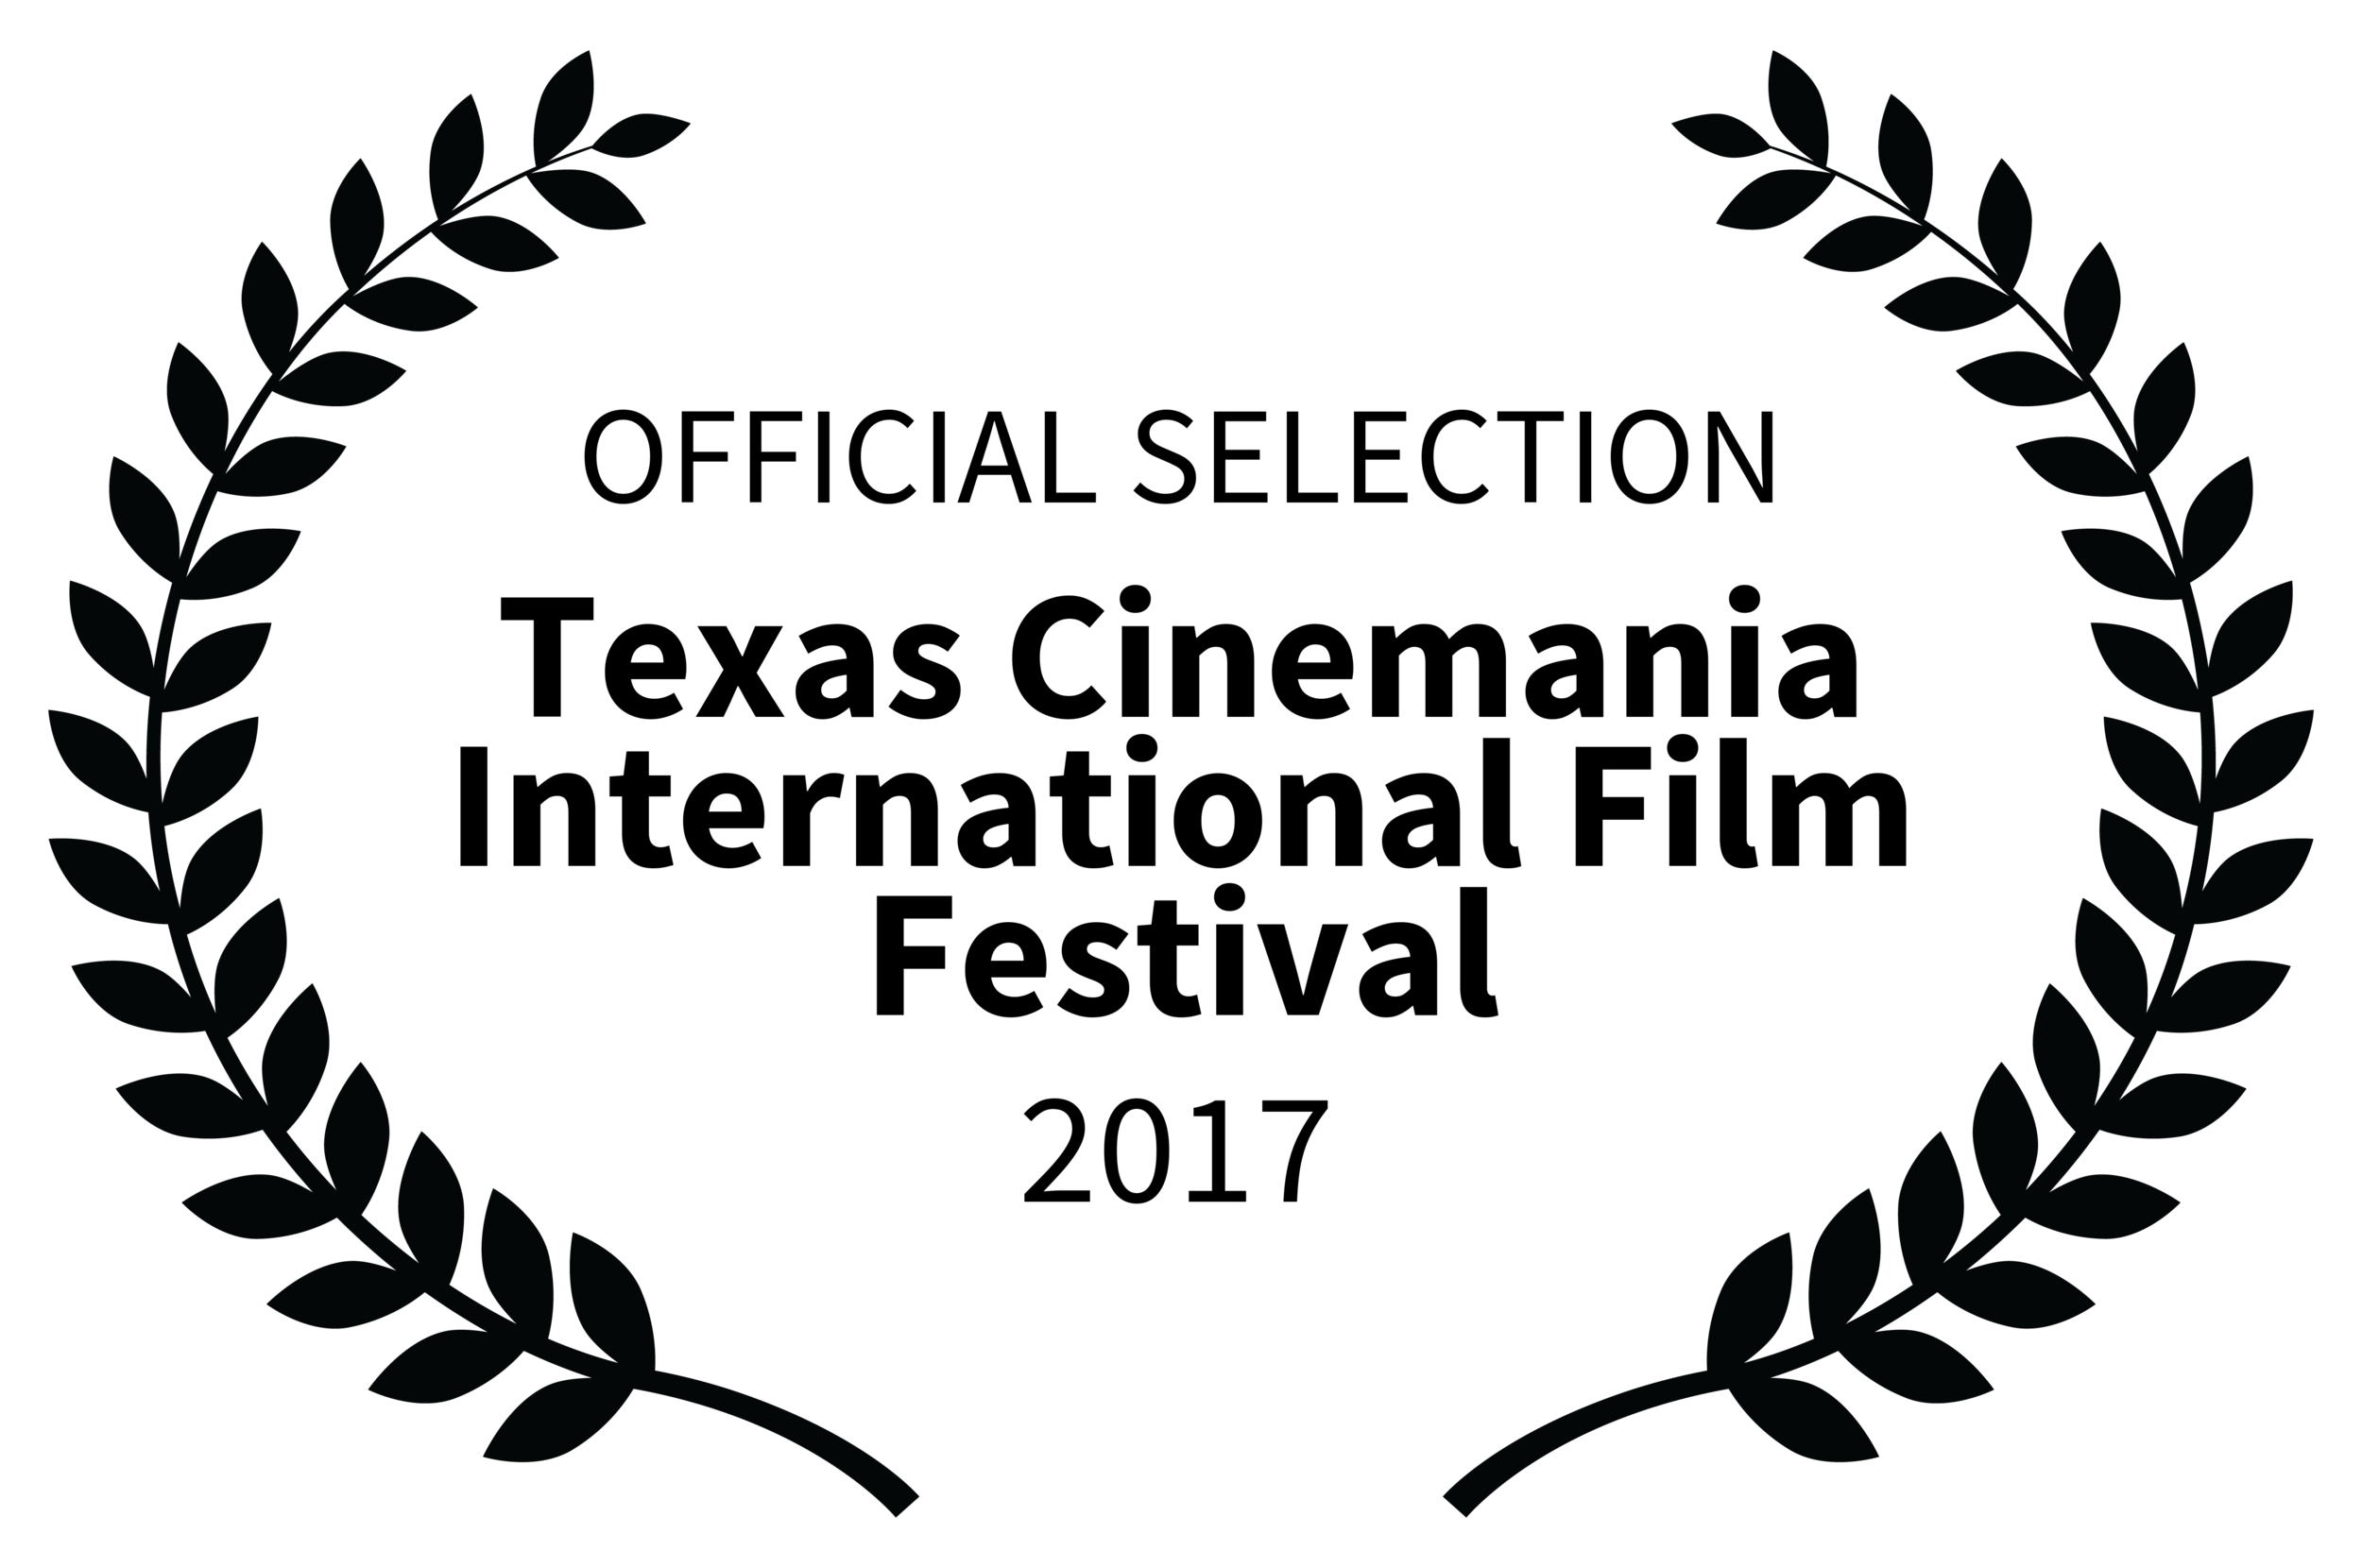 OFFICIALSELECTION-TexasCinemaniaInternationalFilmFestival-2017.png